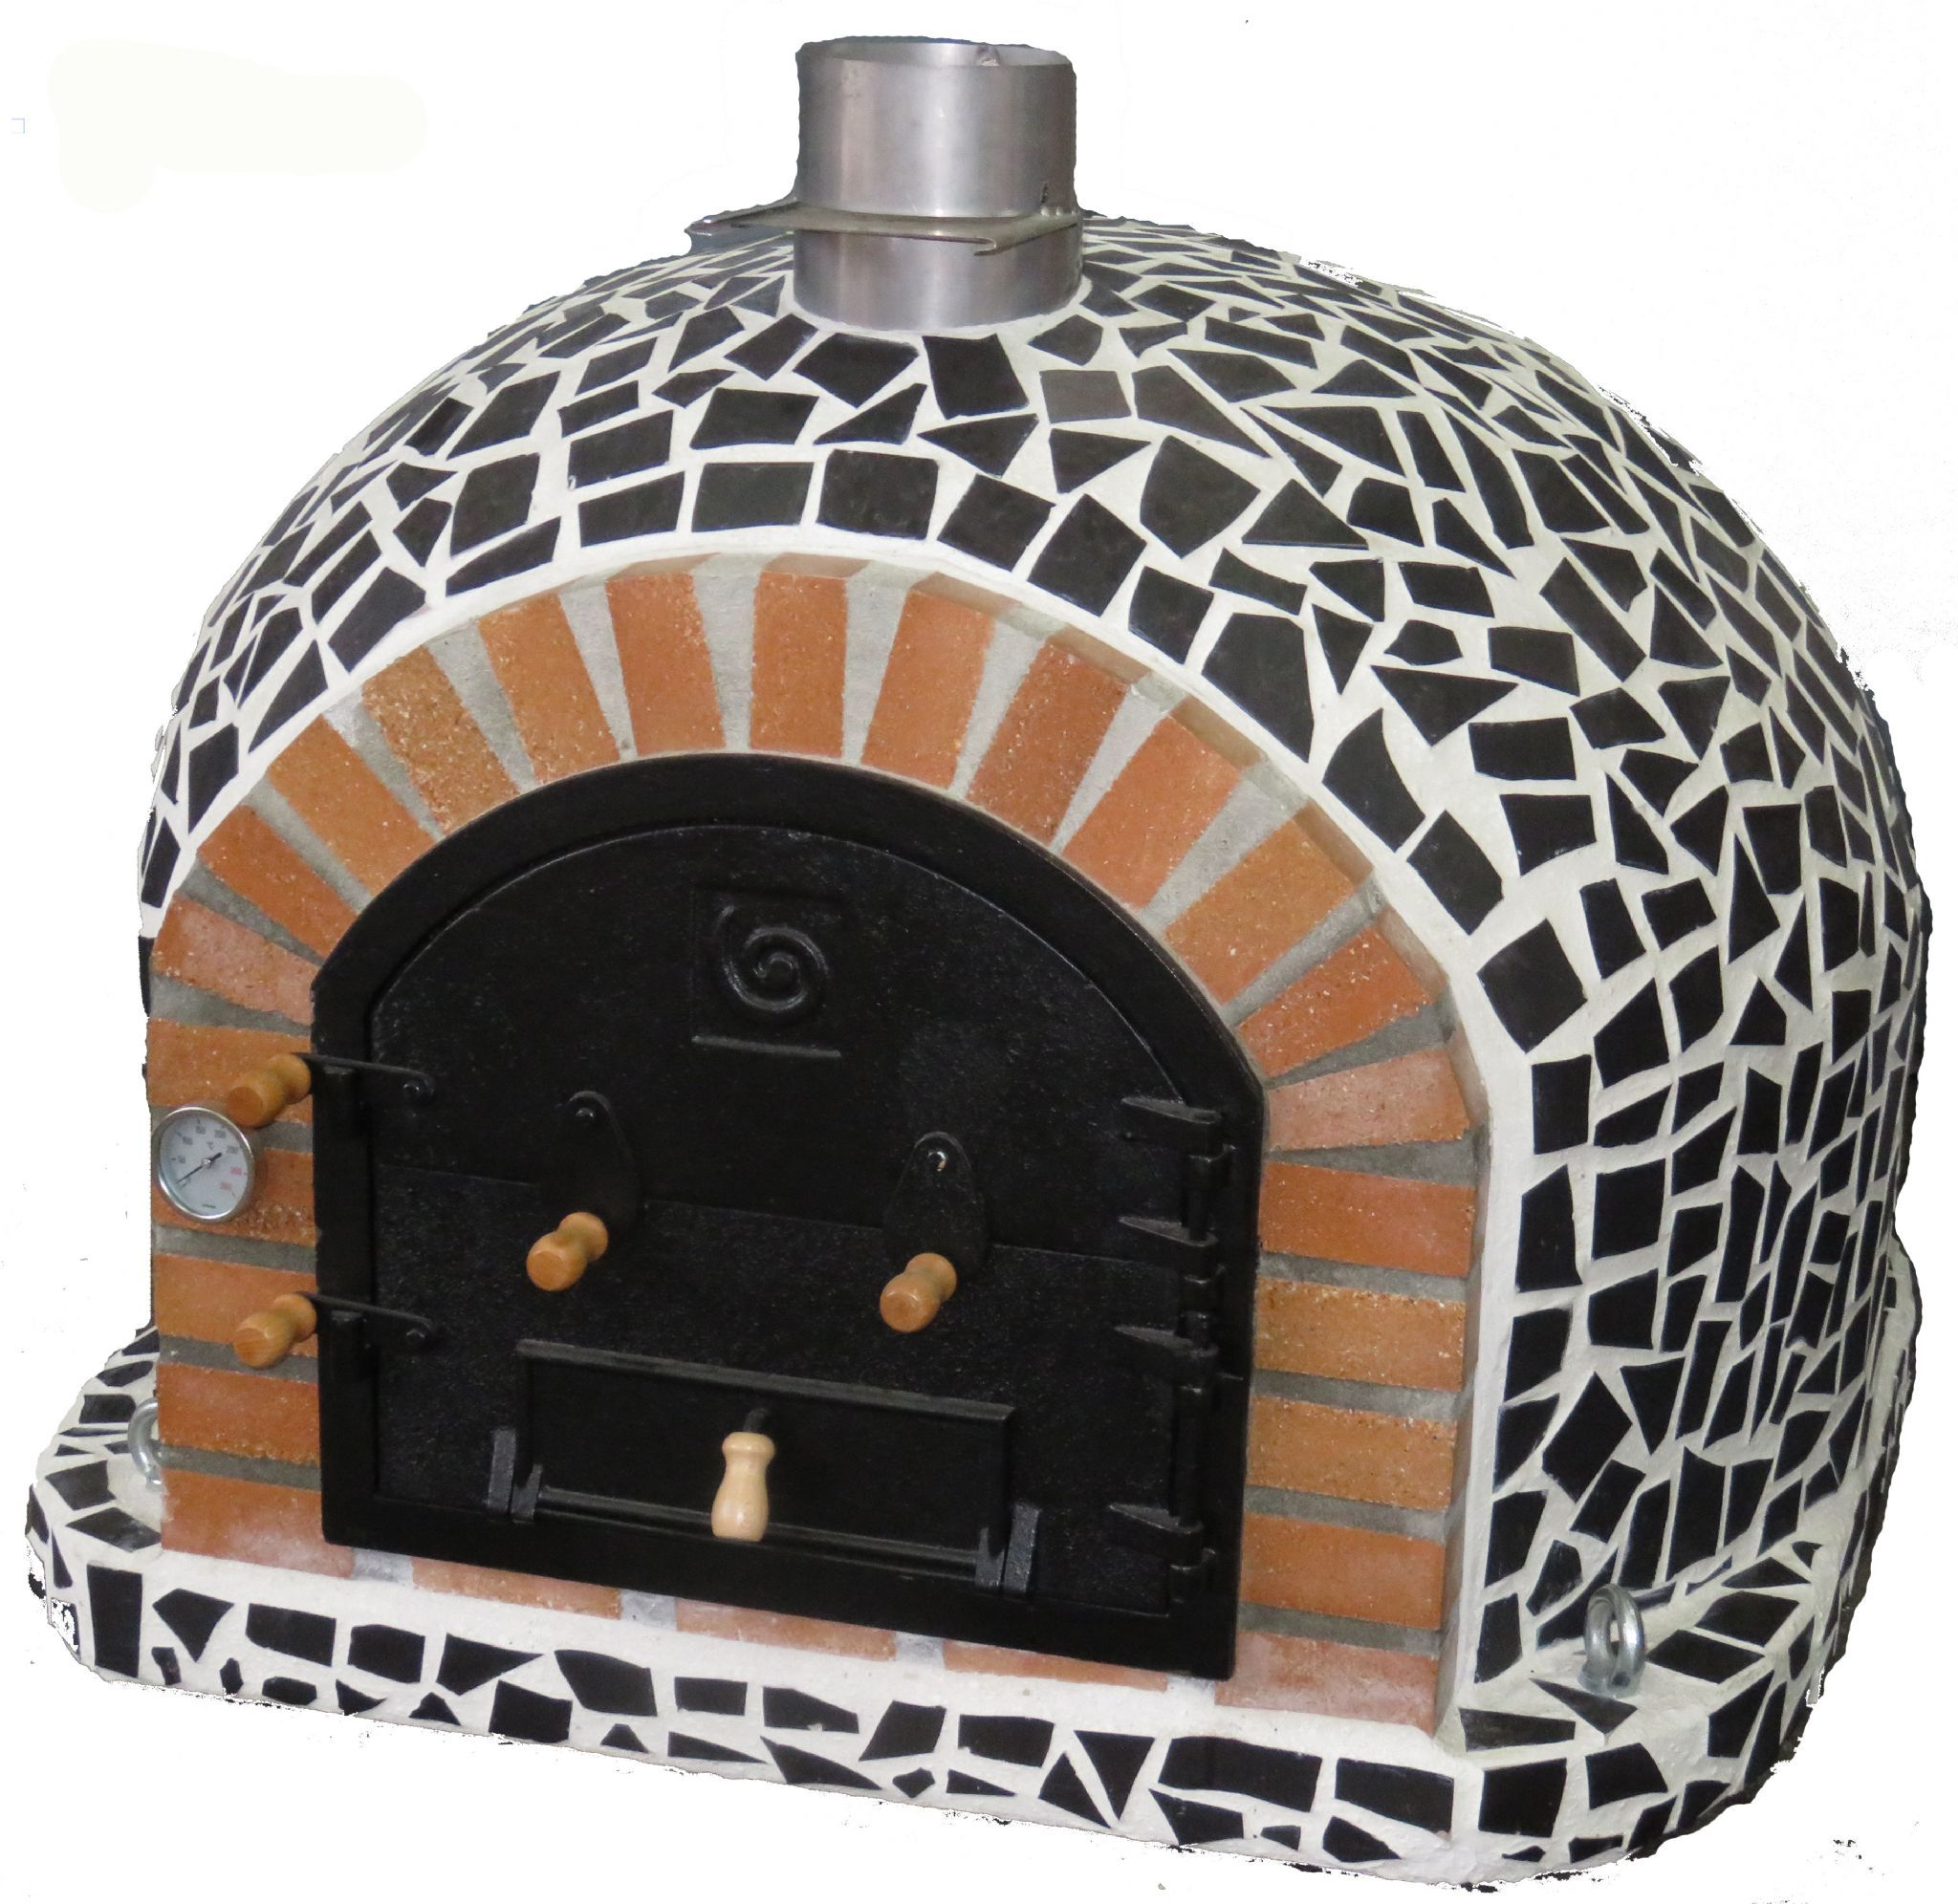 mosaic pizza oven google search pizza oven designs pinterest